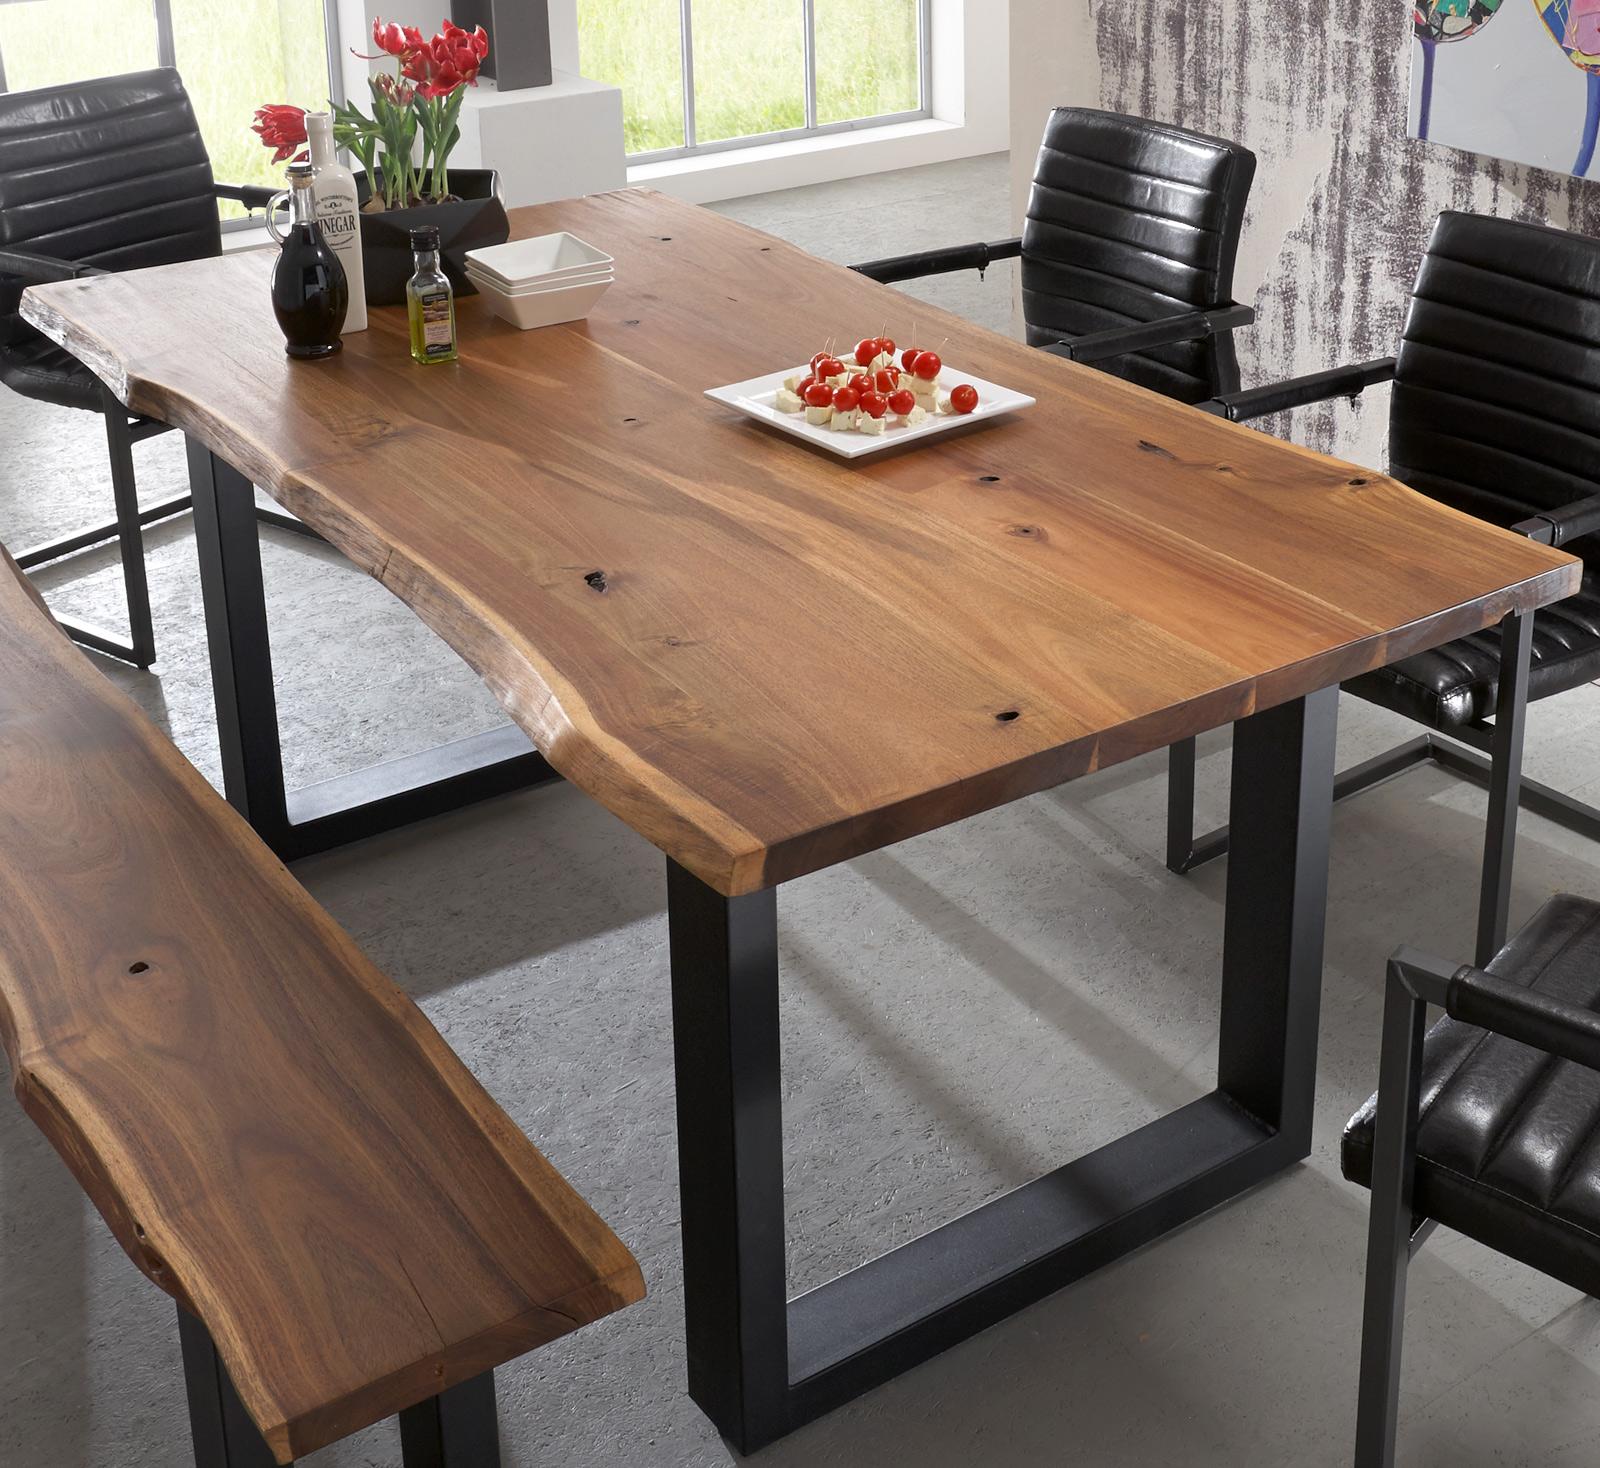 sam tischgruppe 6tlg 180 cm akazie quentin parzivo farbauswahl. Black Bedroom Furniture Sets. Home Design Ideas